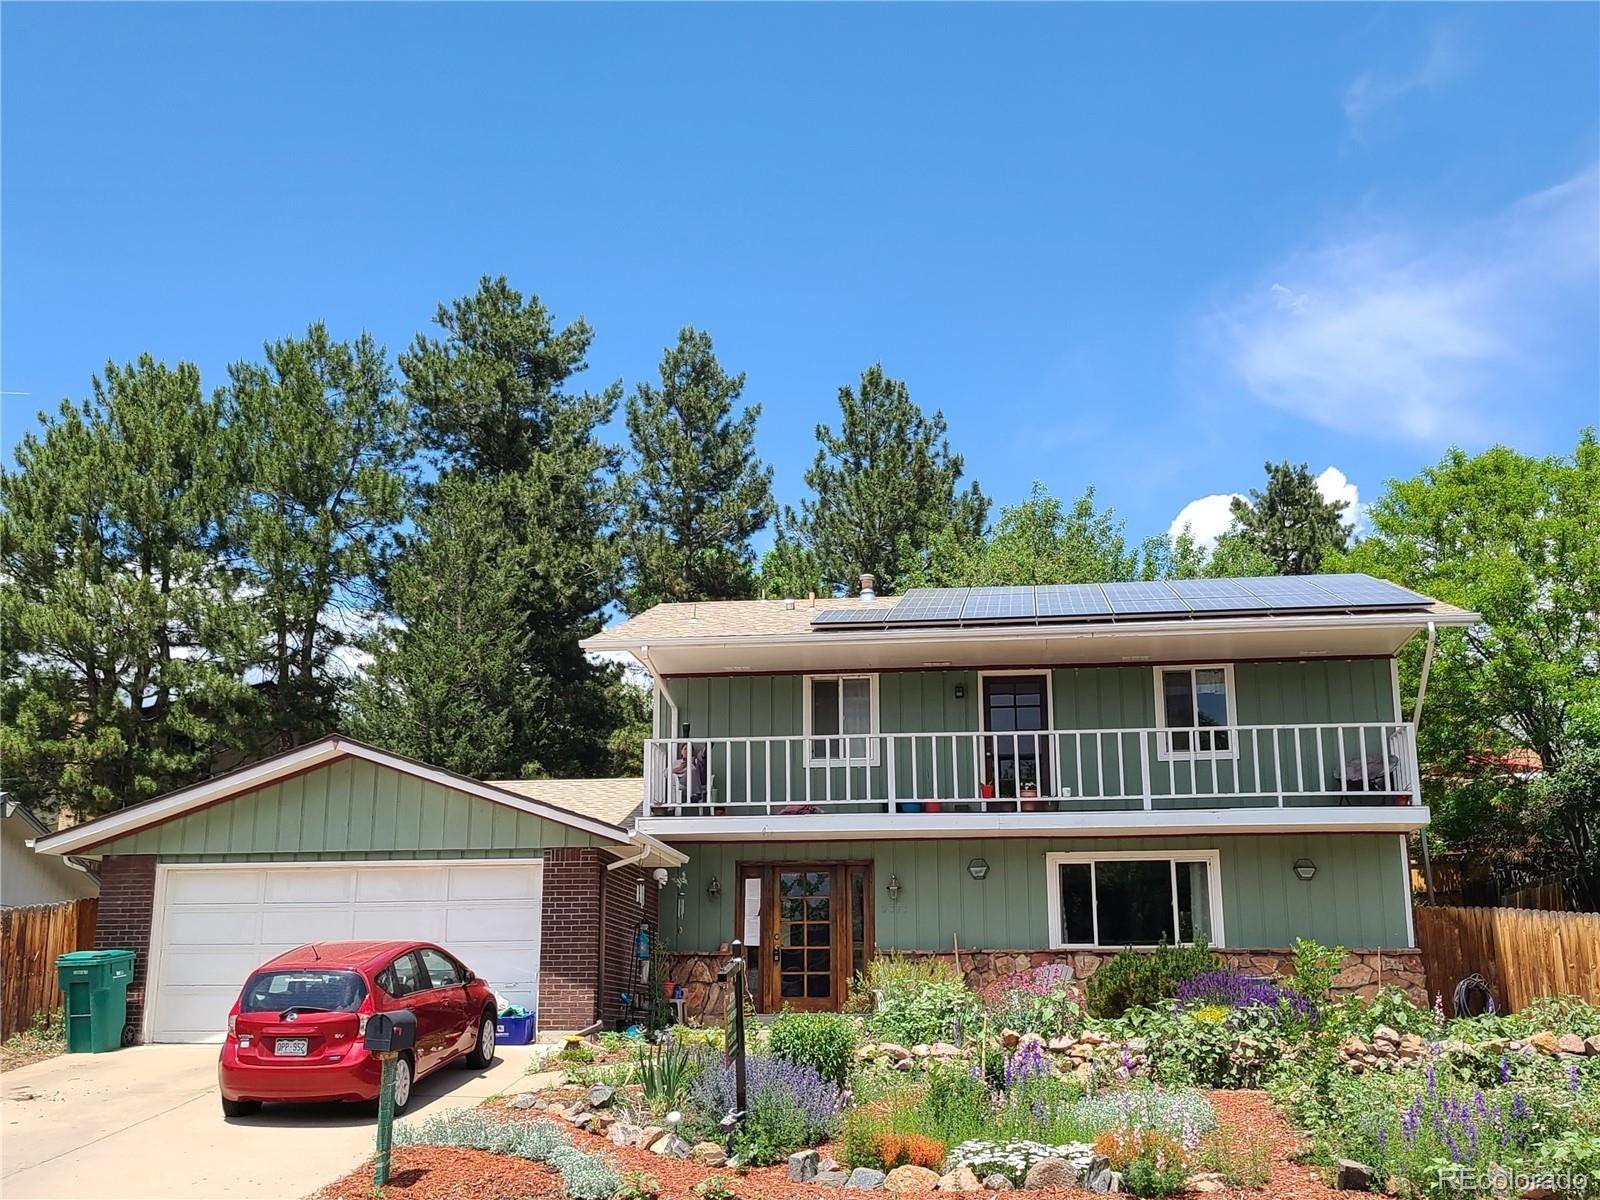 9371 W La Salle Avenue, Lakewood, CO 80227 - #: 7276051